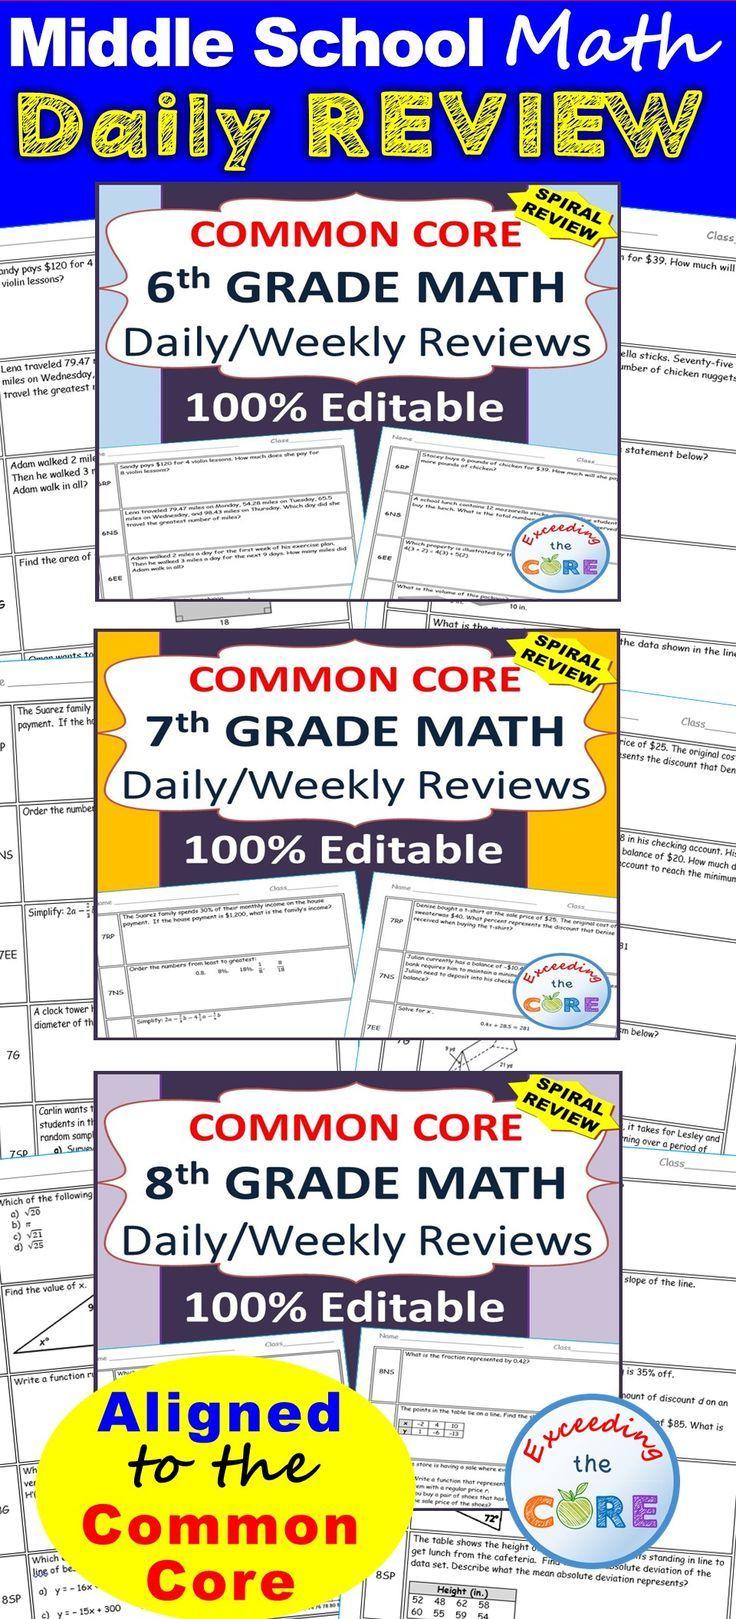 813 best Seventh Grade Math images on Pinterest | Algebra 1, Algebra ...